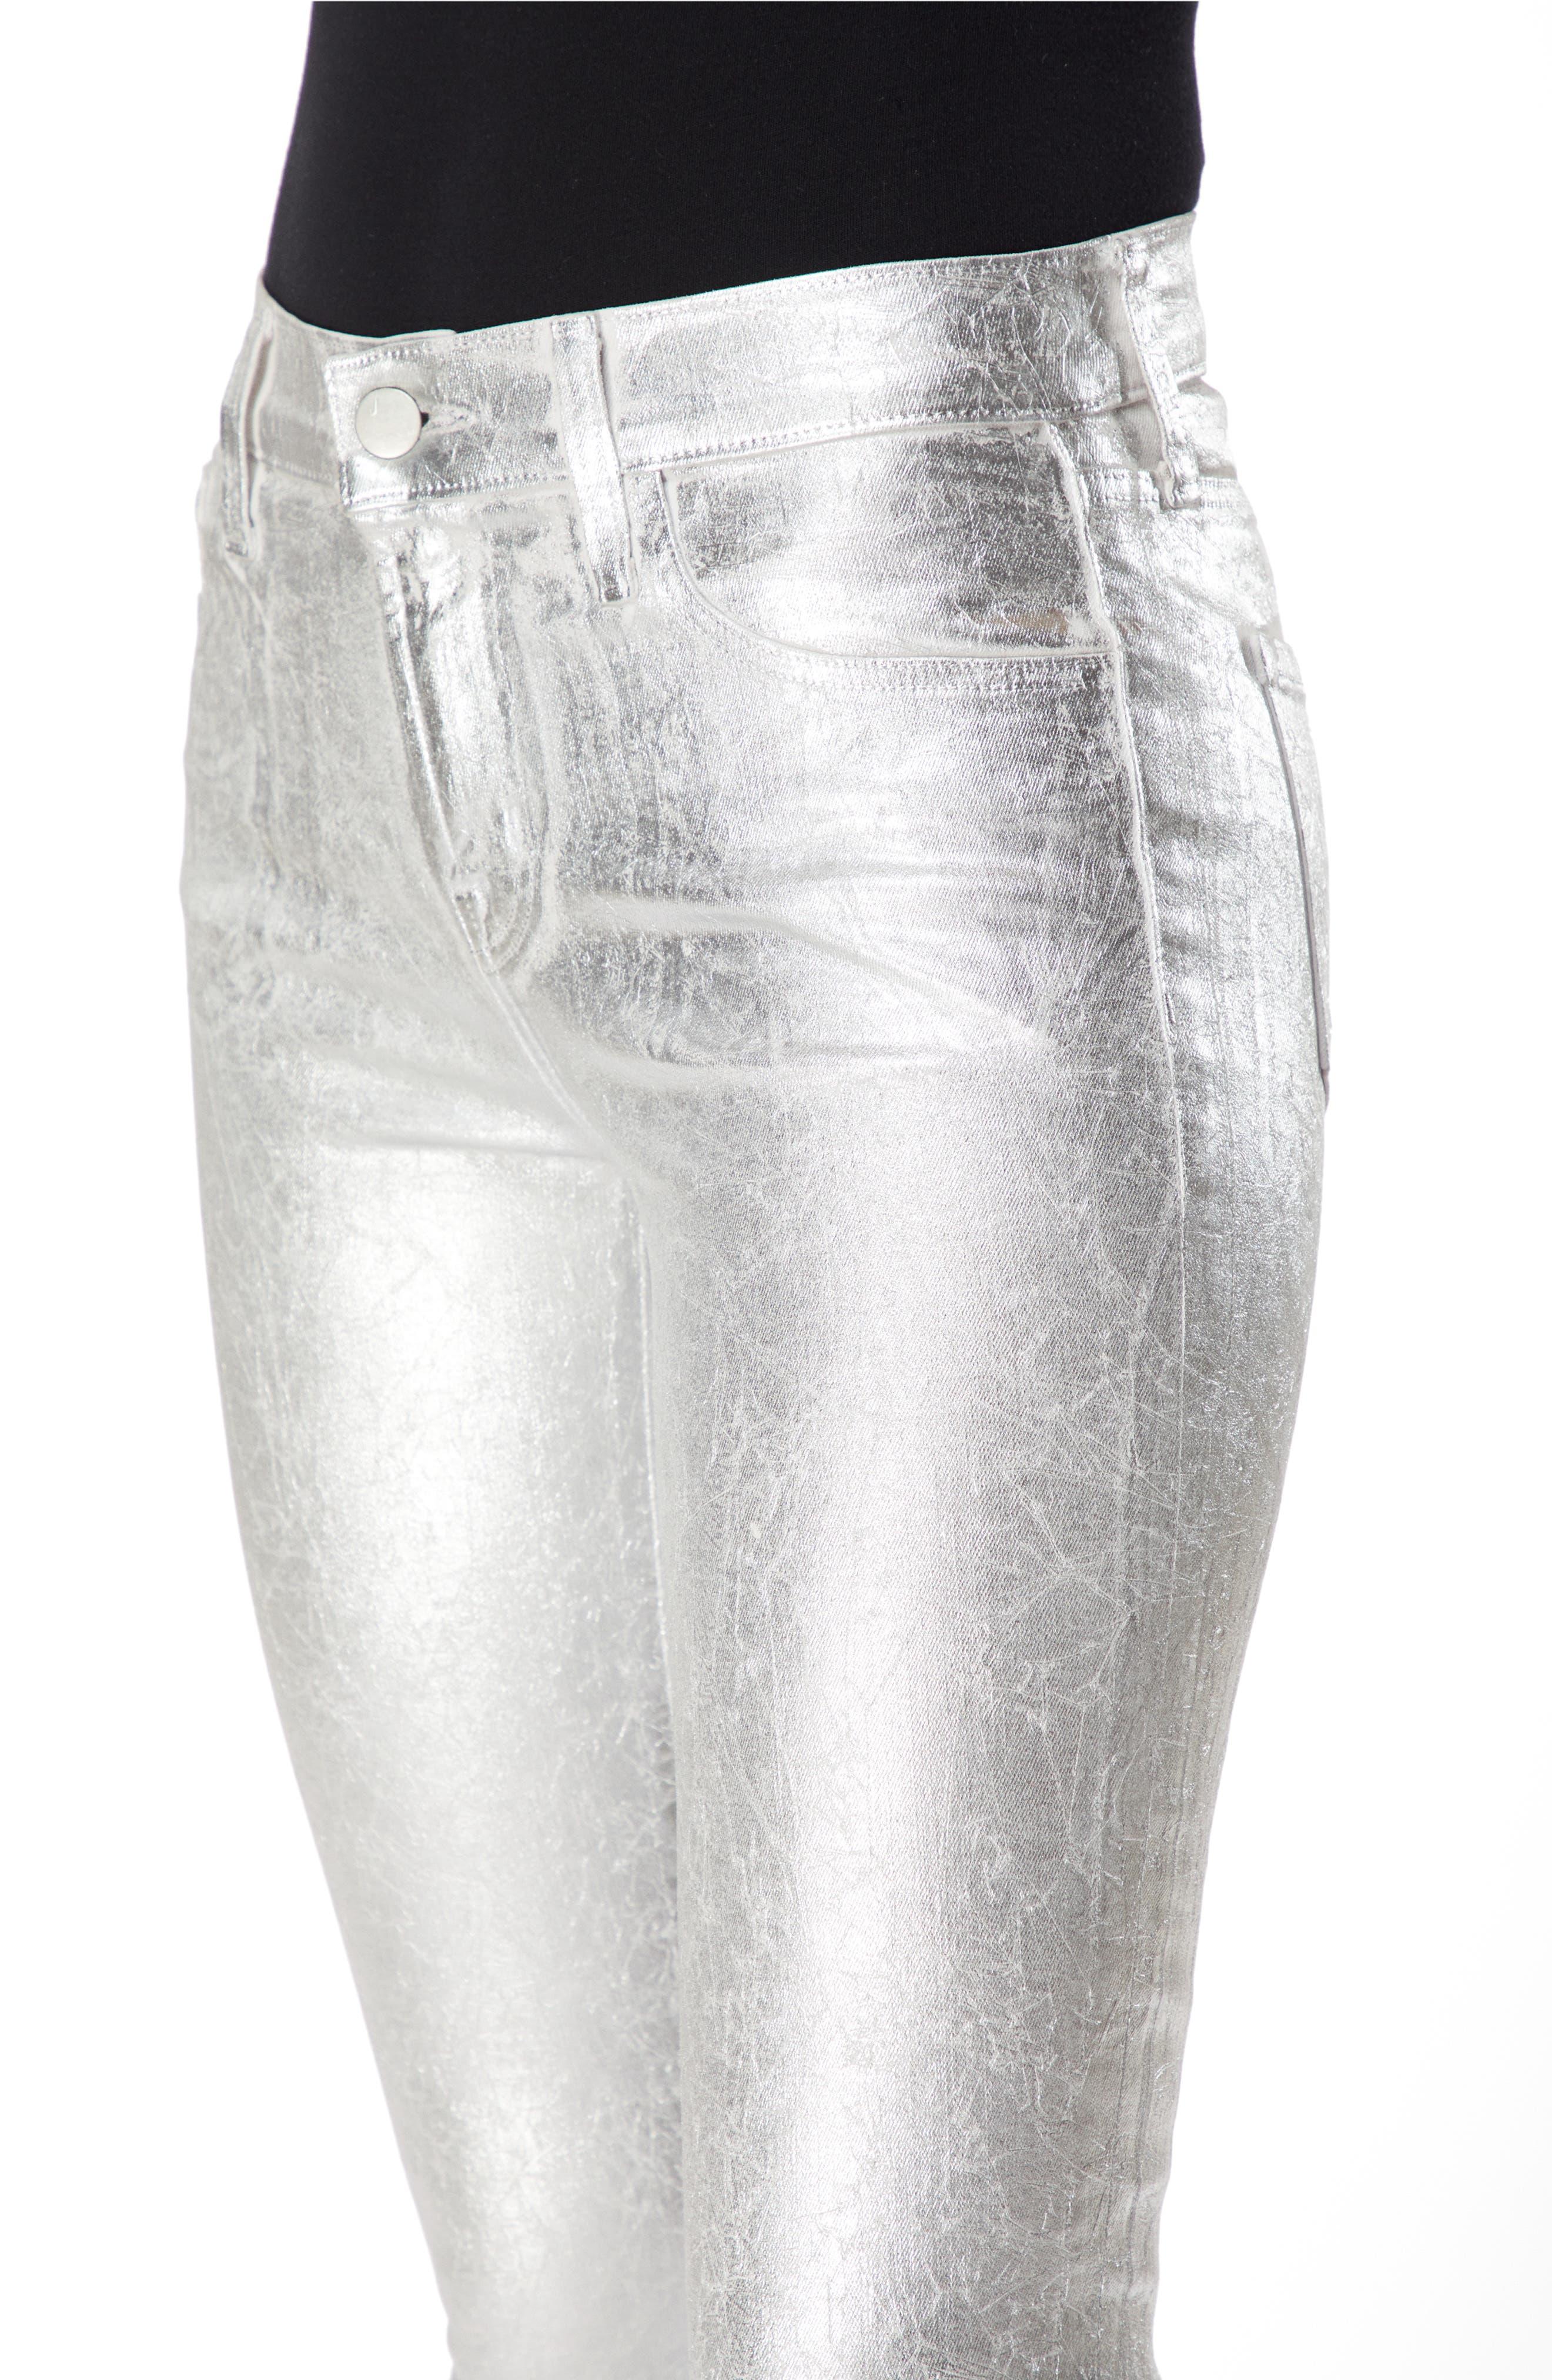 835 Capri Skinny Jeans,                             Alternate thumbnail 4, color,                             SUPERMOON CRISTALLINE